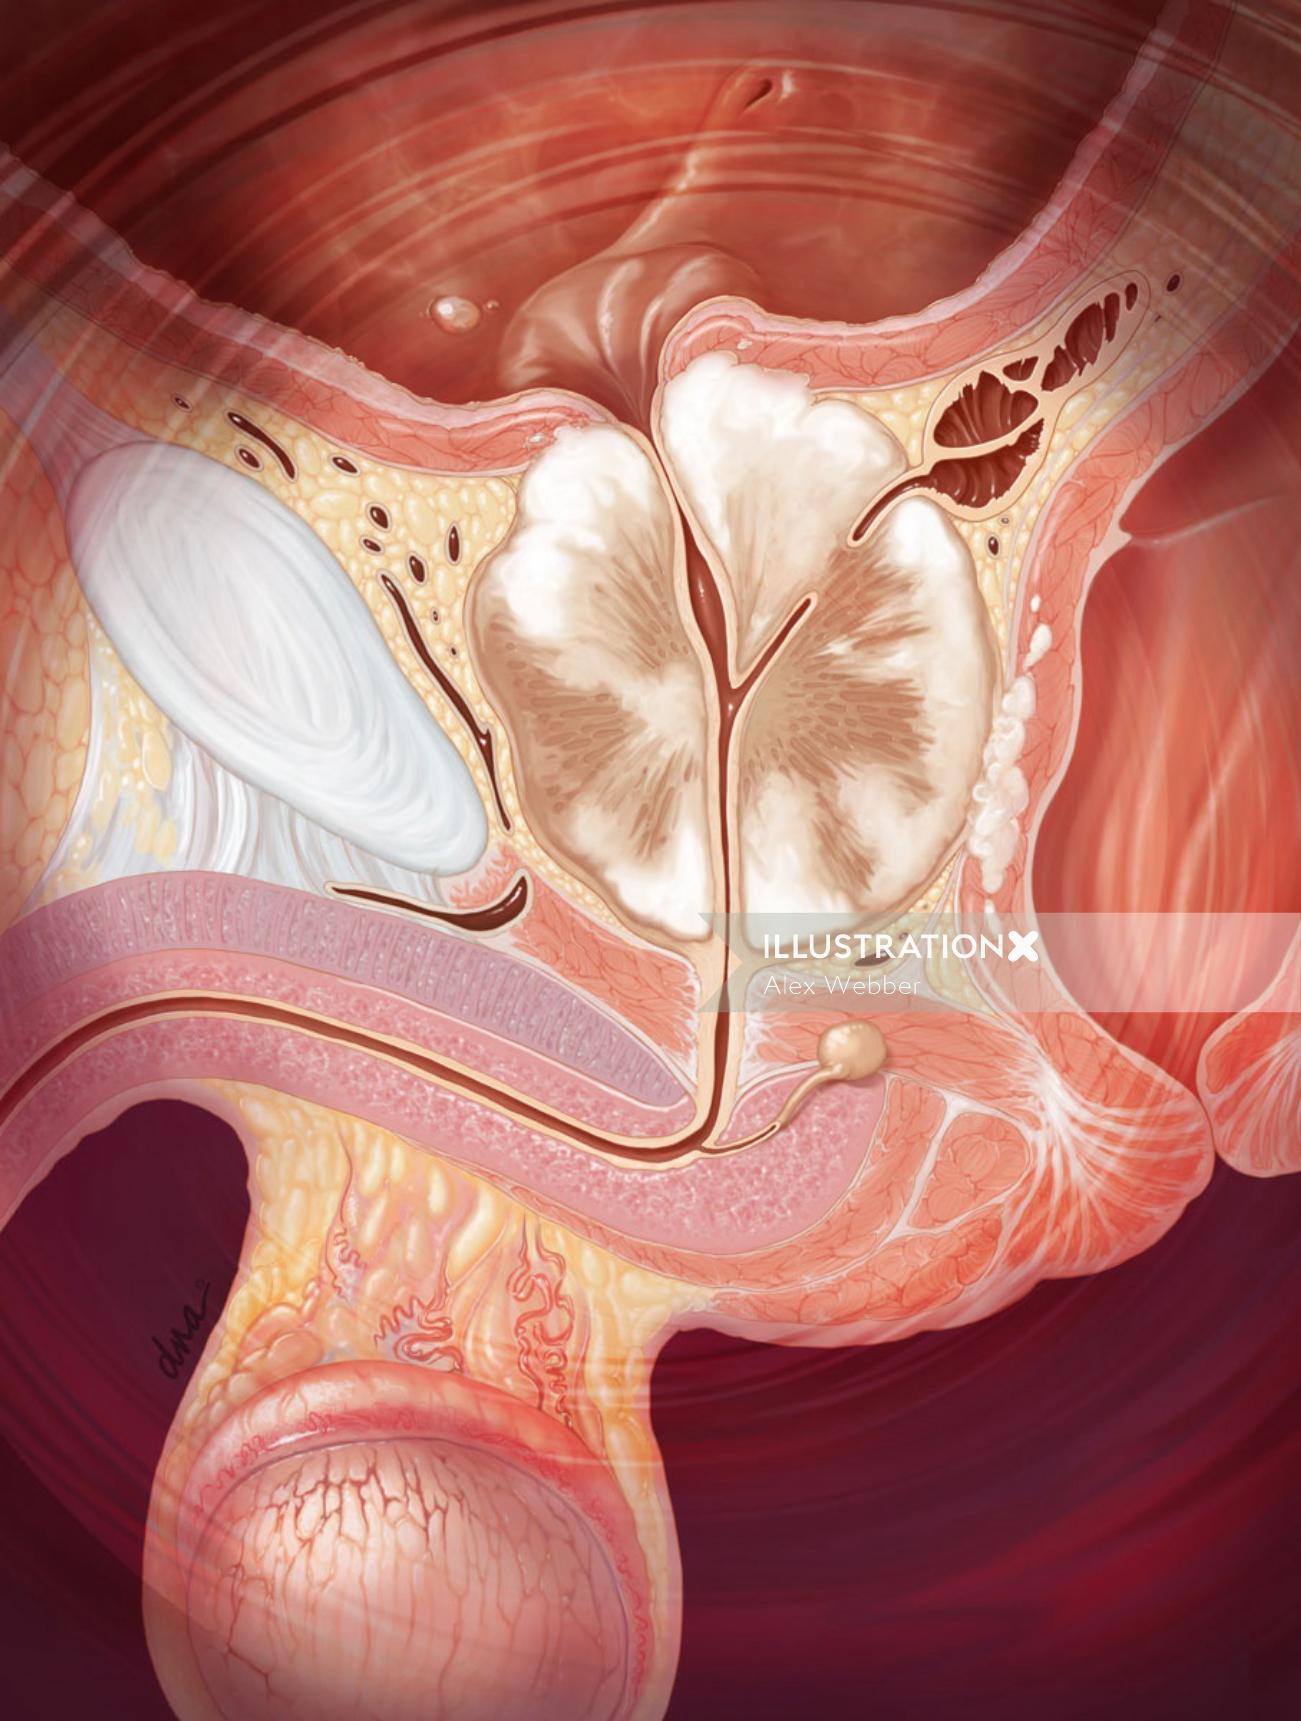 Prostate cancer illustration by AlexBaker